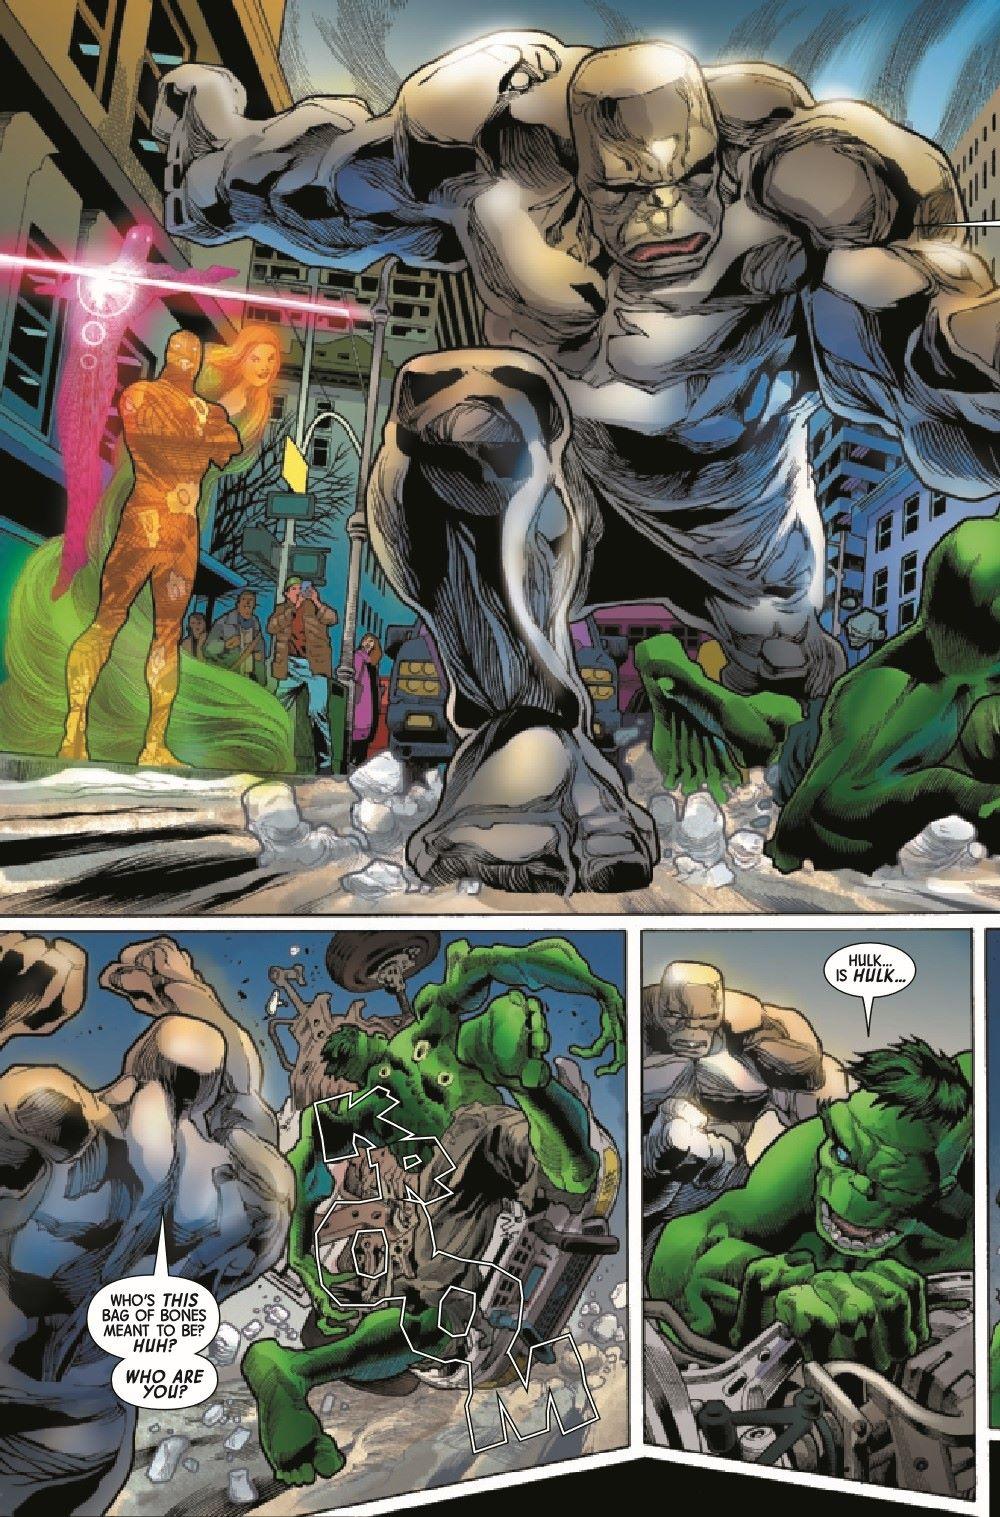 HULK2018044_Preview-2 ComicList Previews: THE IMMORTAL HULK #44